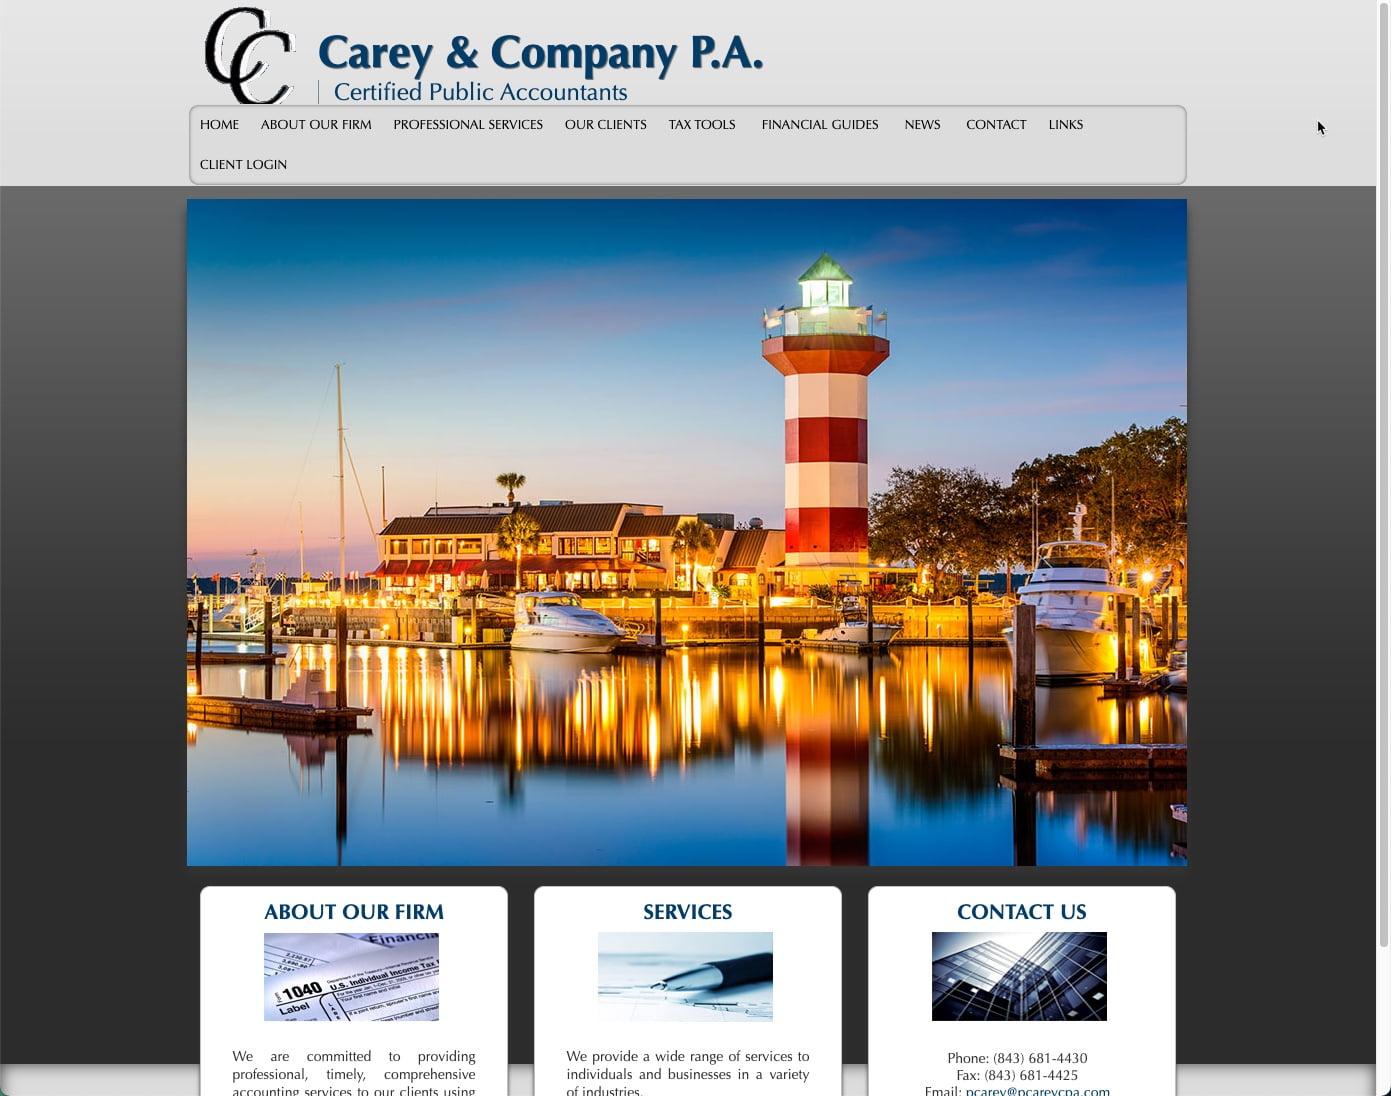 Carey & Company, P.A.